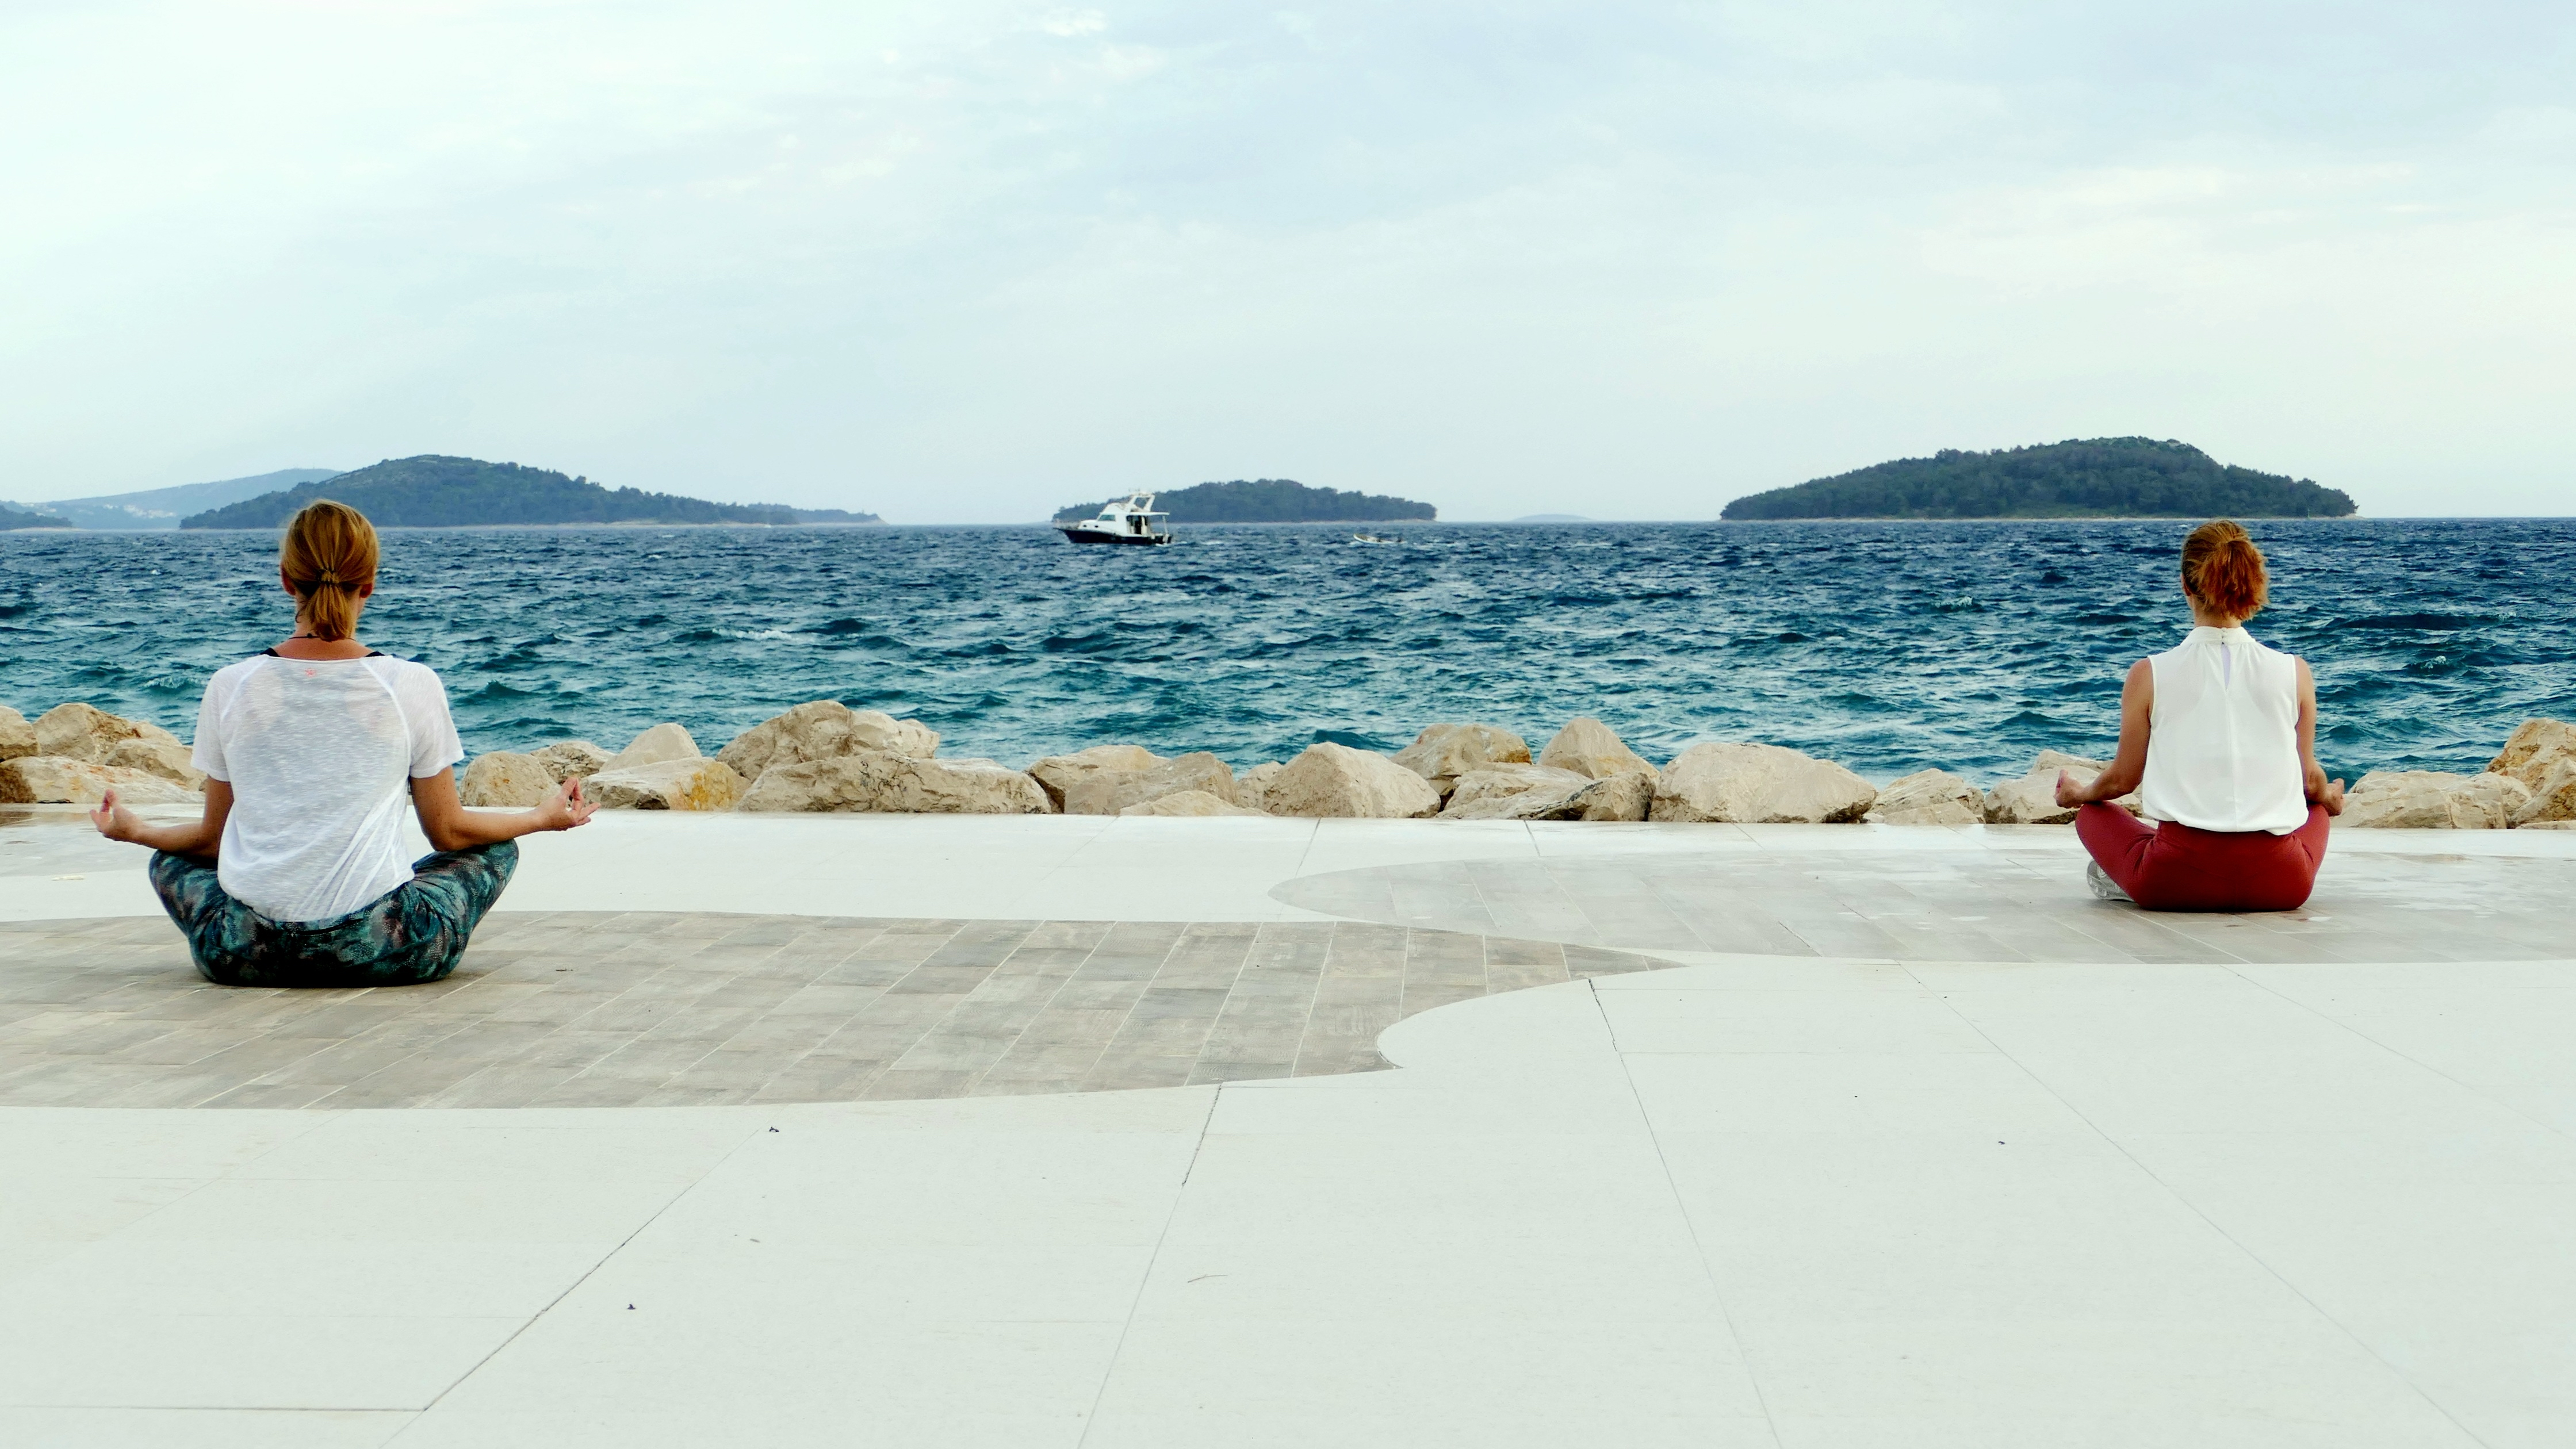 pilates und yoga retreat 25. september - 2. oktober 2021 in kroatien